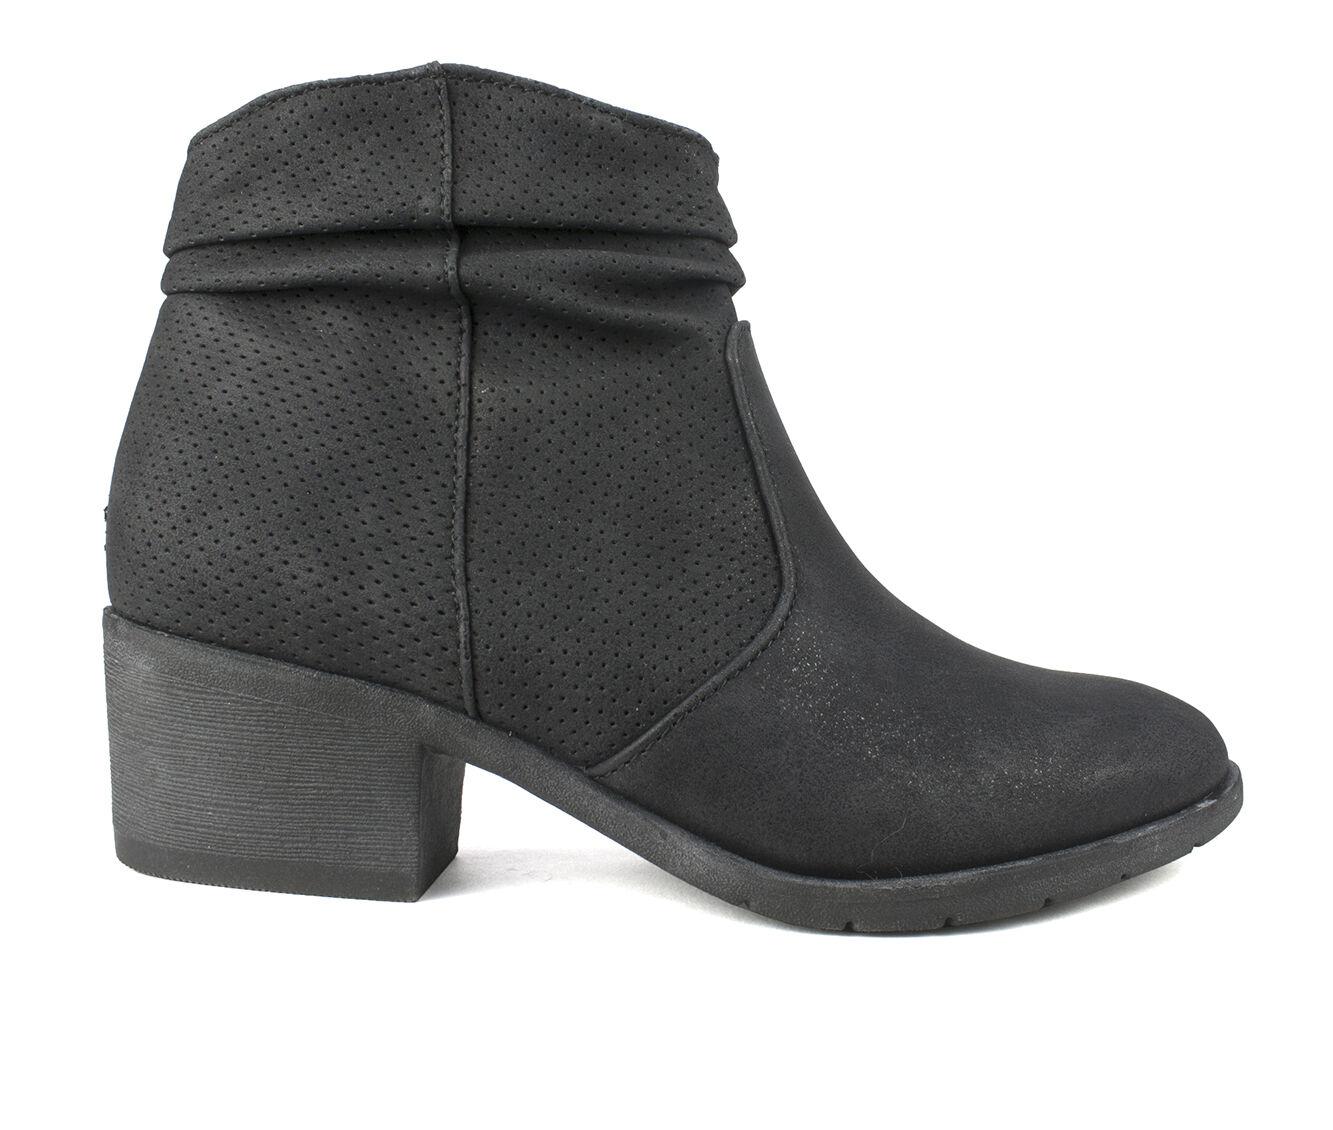 uk shoes_kd5346